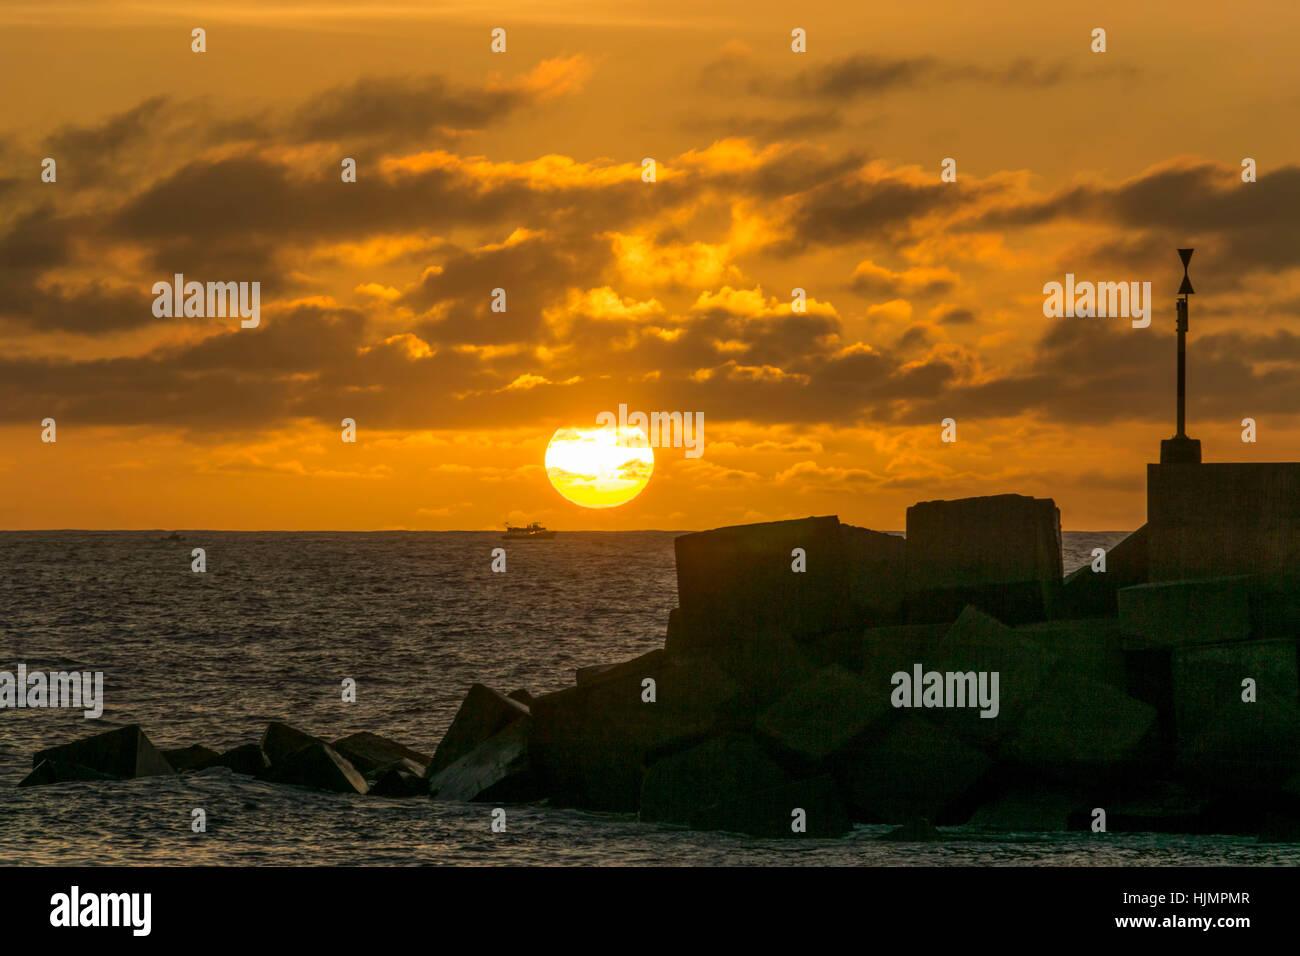 Puerto de Tazacorte, Sonnenuntergang, atlantische Ozean, La Palma, Kanarische Inseln, Spanien Stockbild